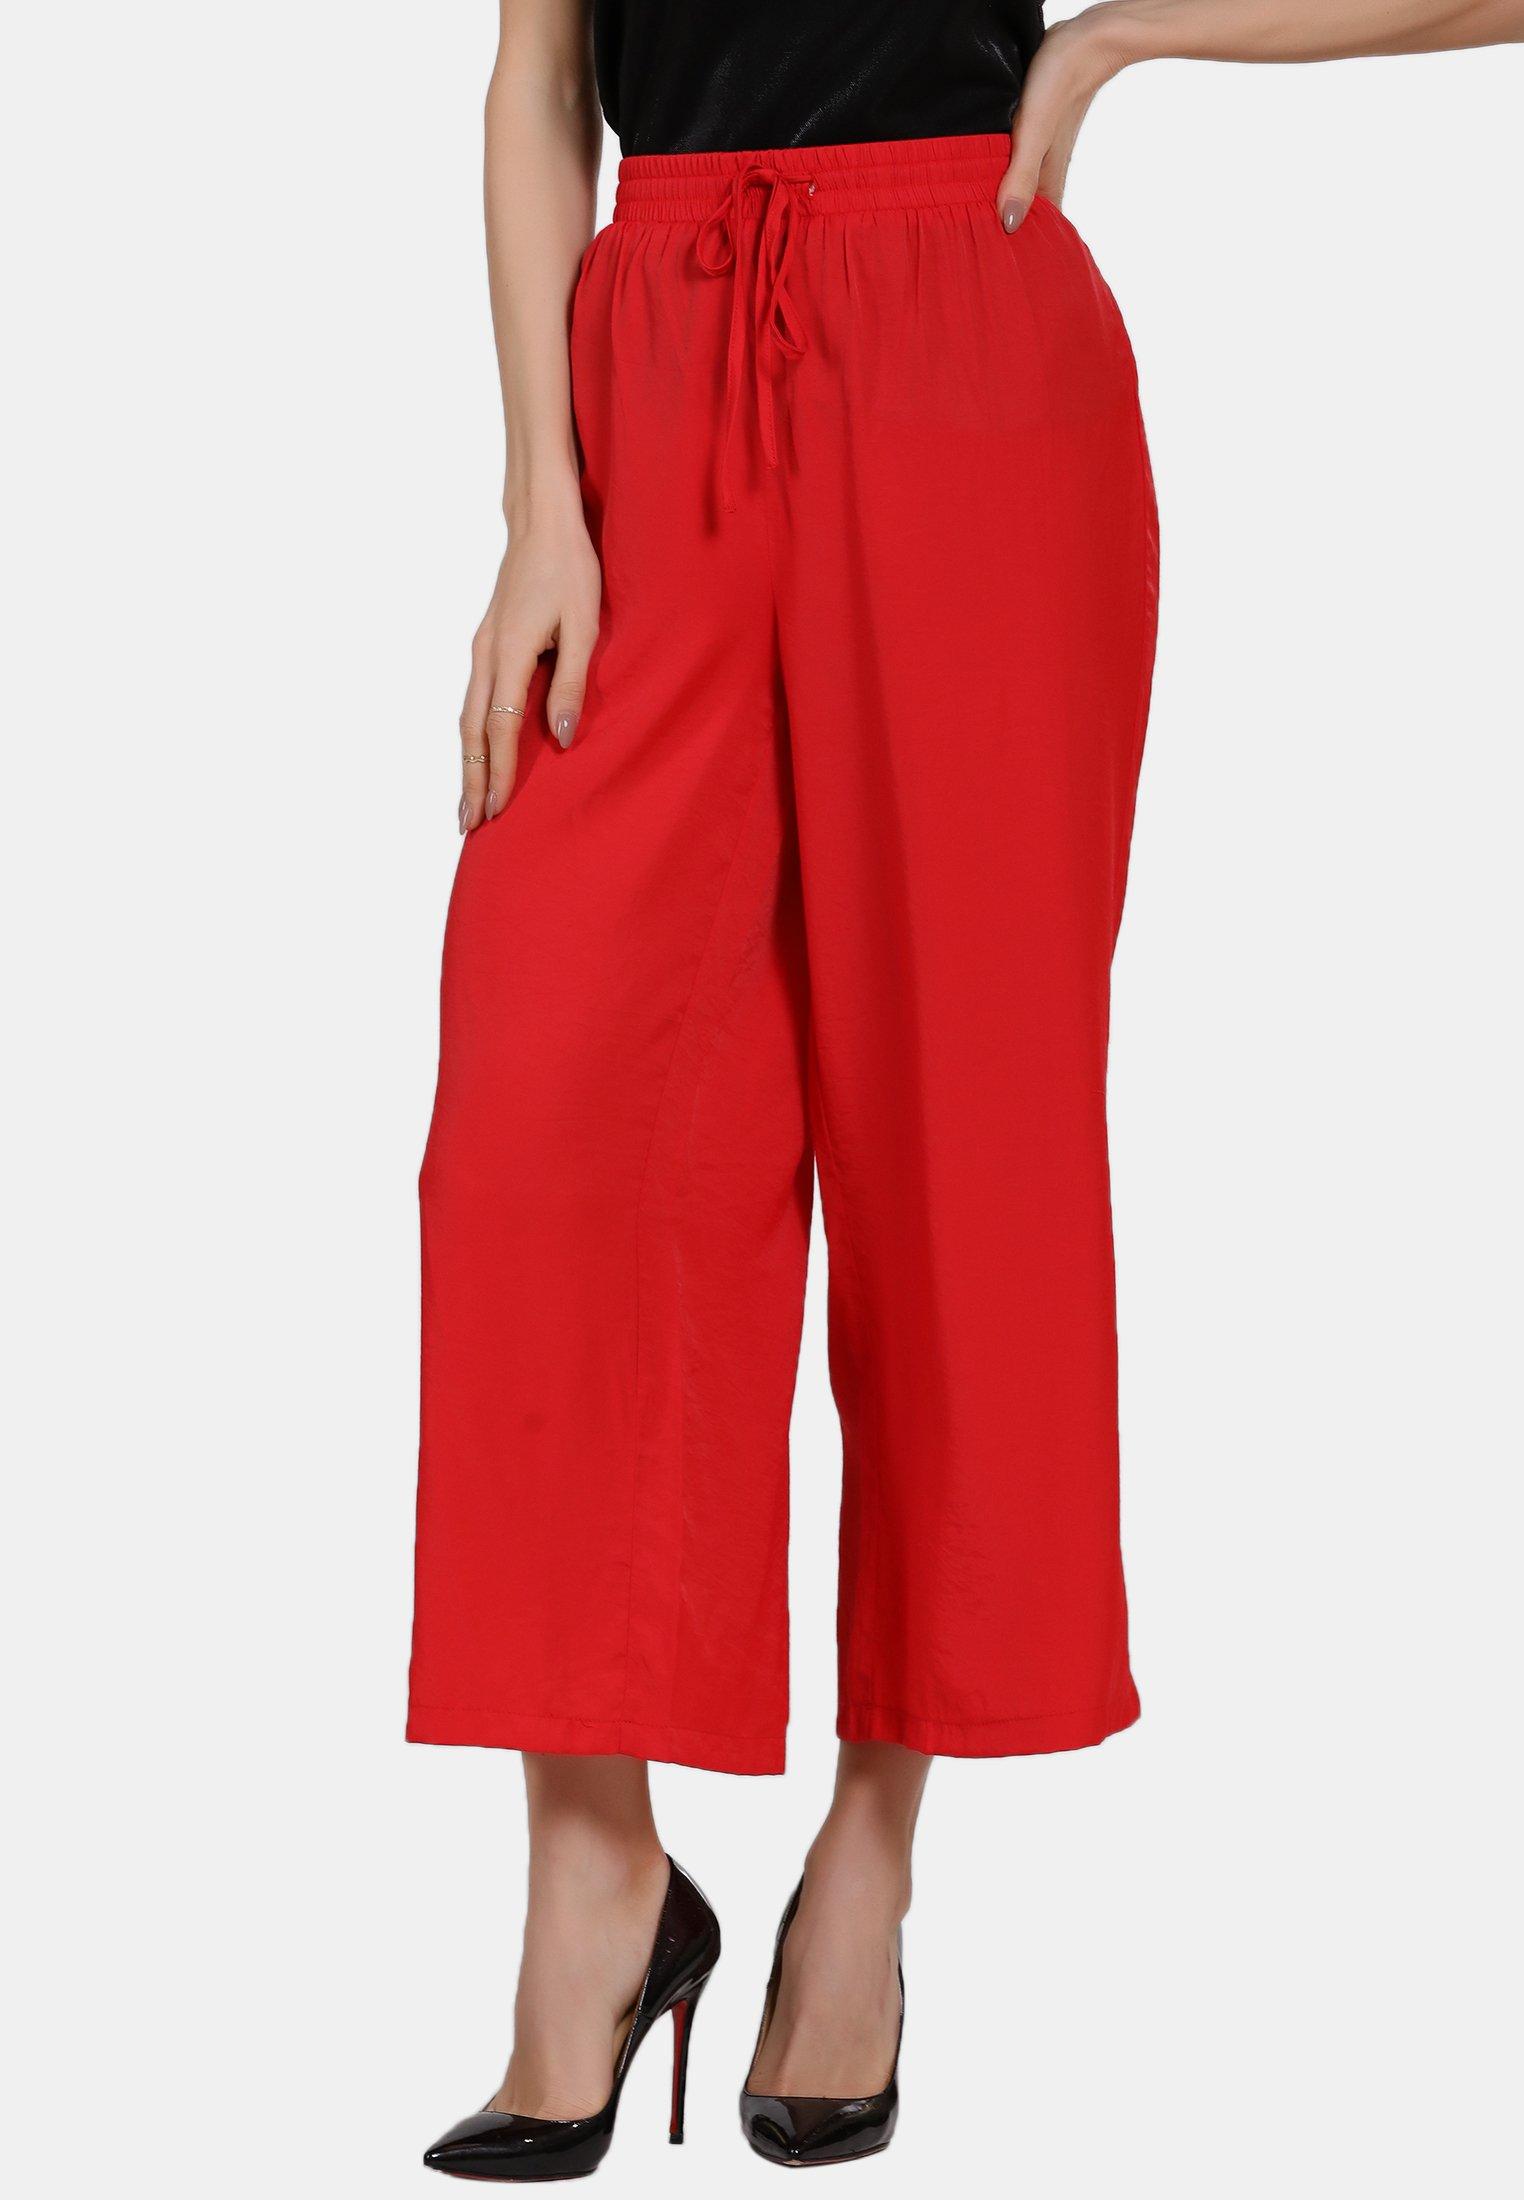 New Lower Prices Women's Clothing faina Trousers rot 7MErtSMjx